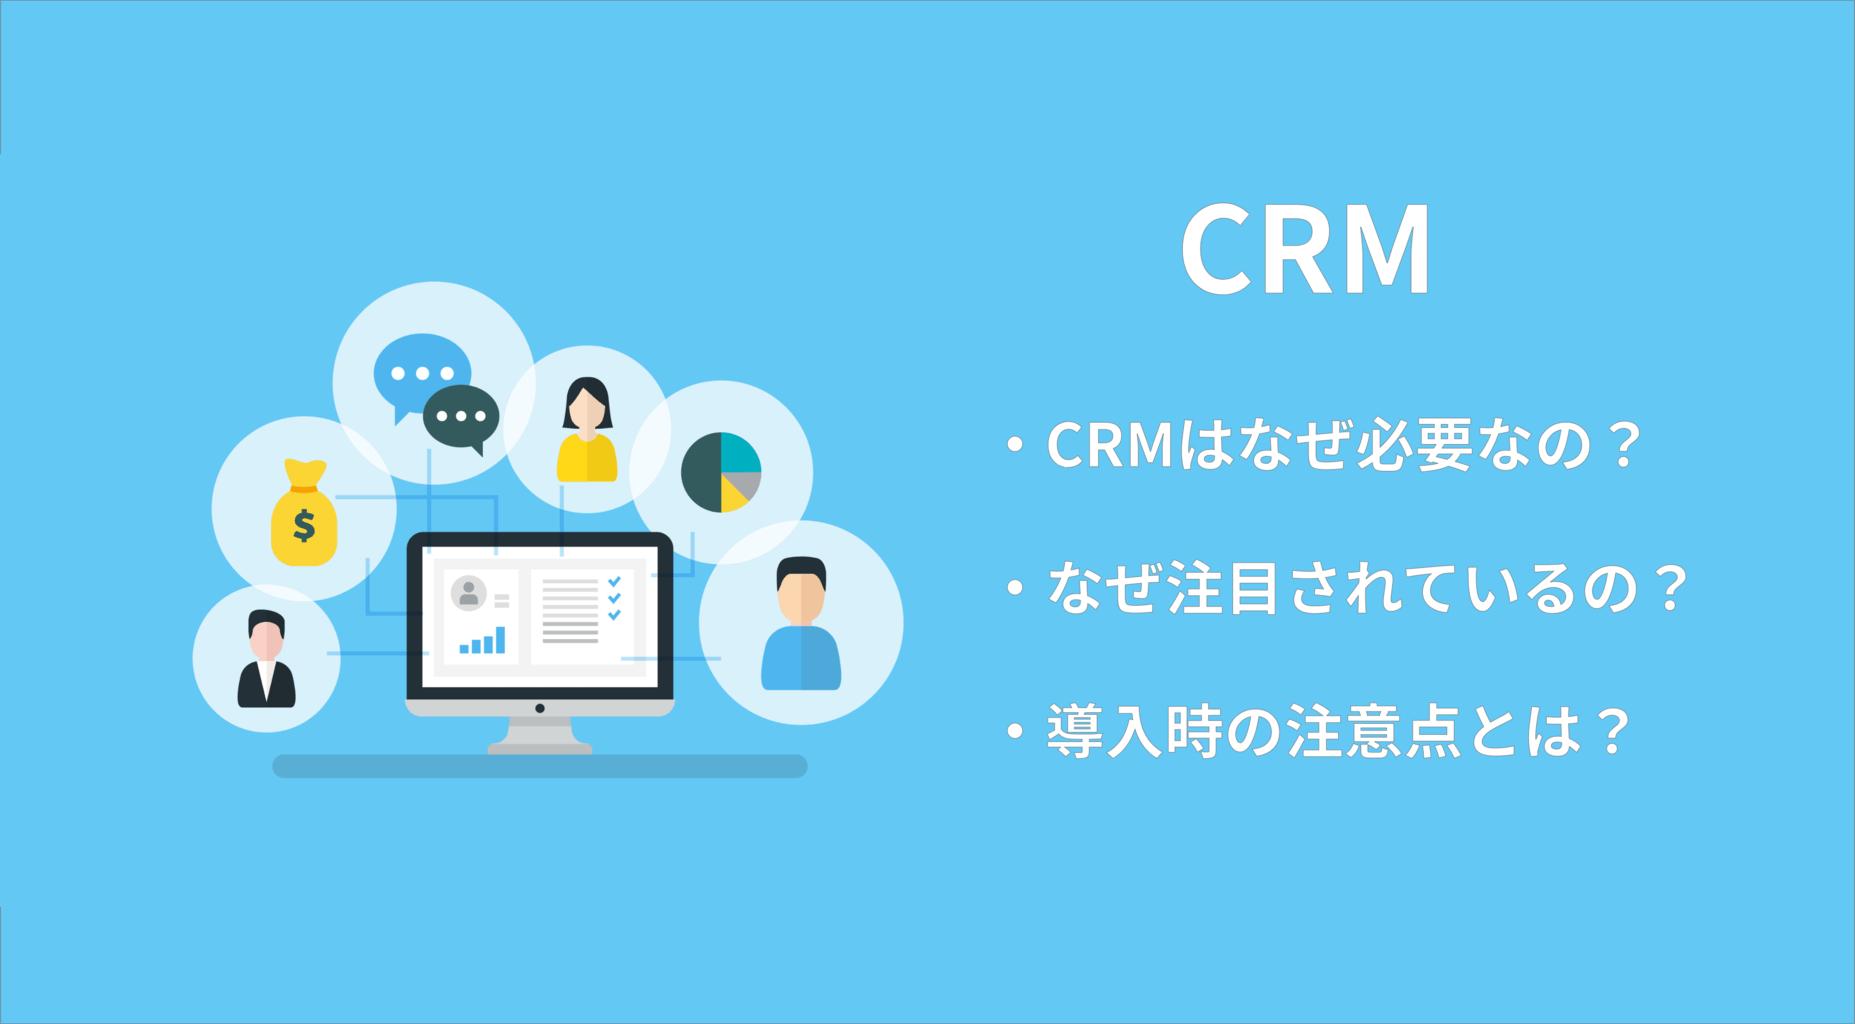 CRMの必要性とは?なぜ重要なのかを詳しく解説!